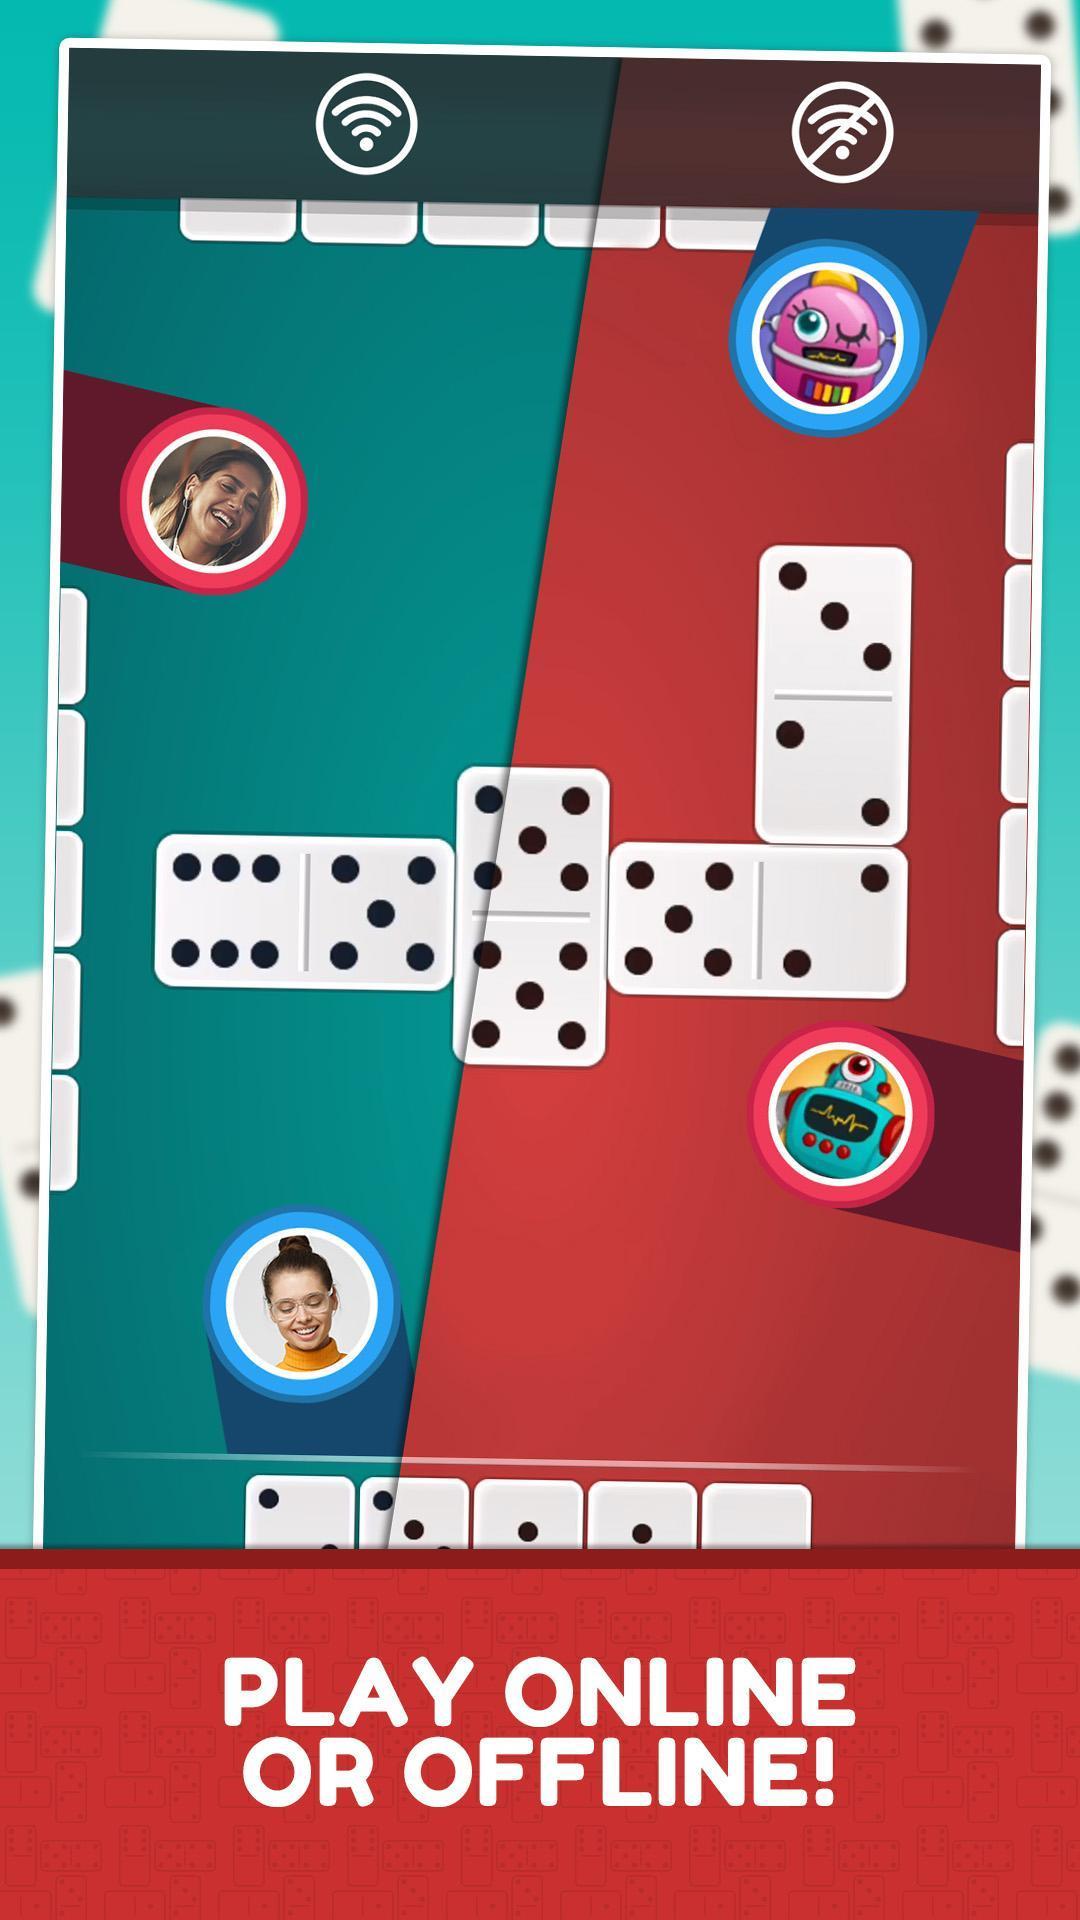 Dominoes Jogatina: Classic Board Game 5.1.1 Screenshot 5